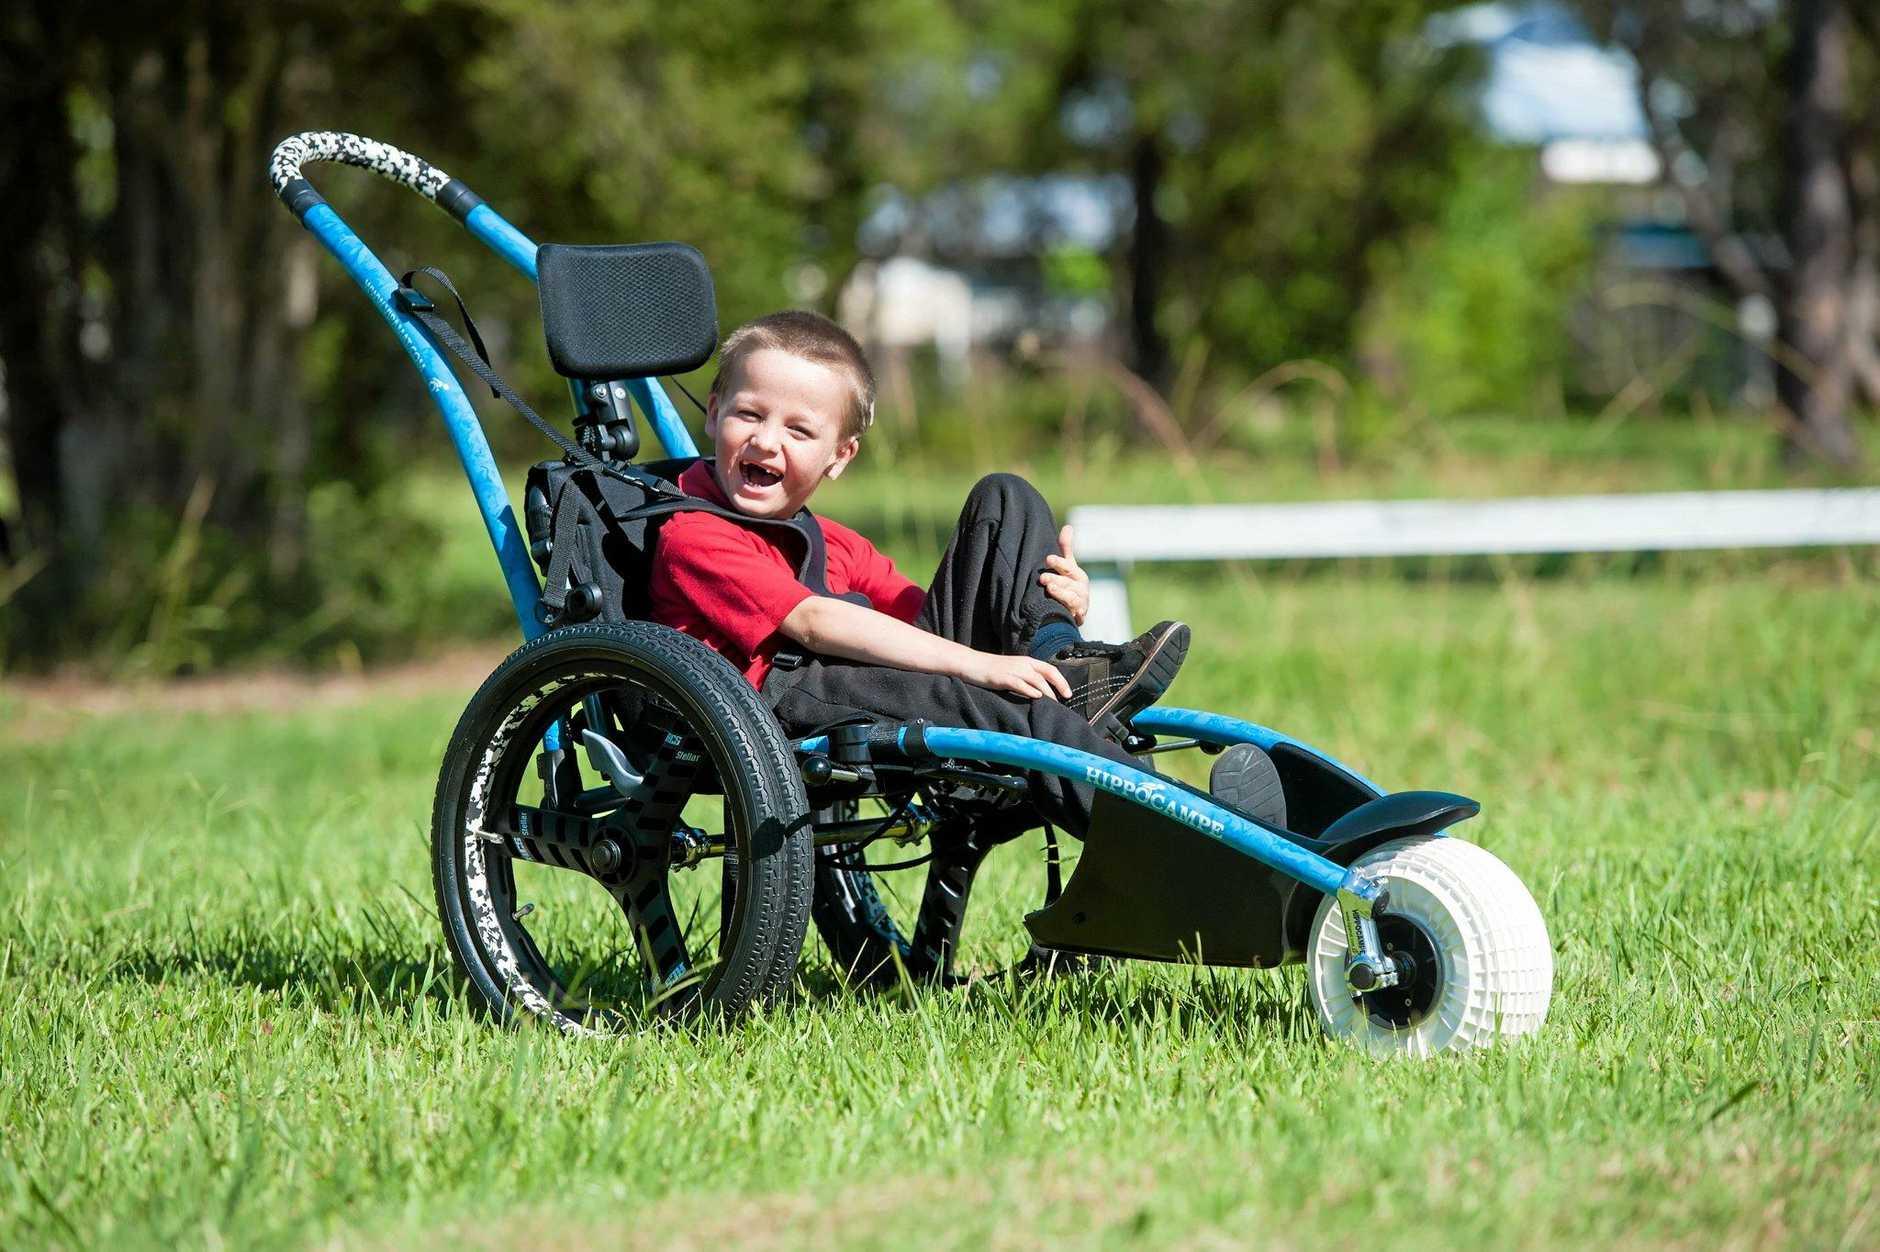 Christian Sheridan-Bridges with his new beach and park wheelchair,